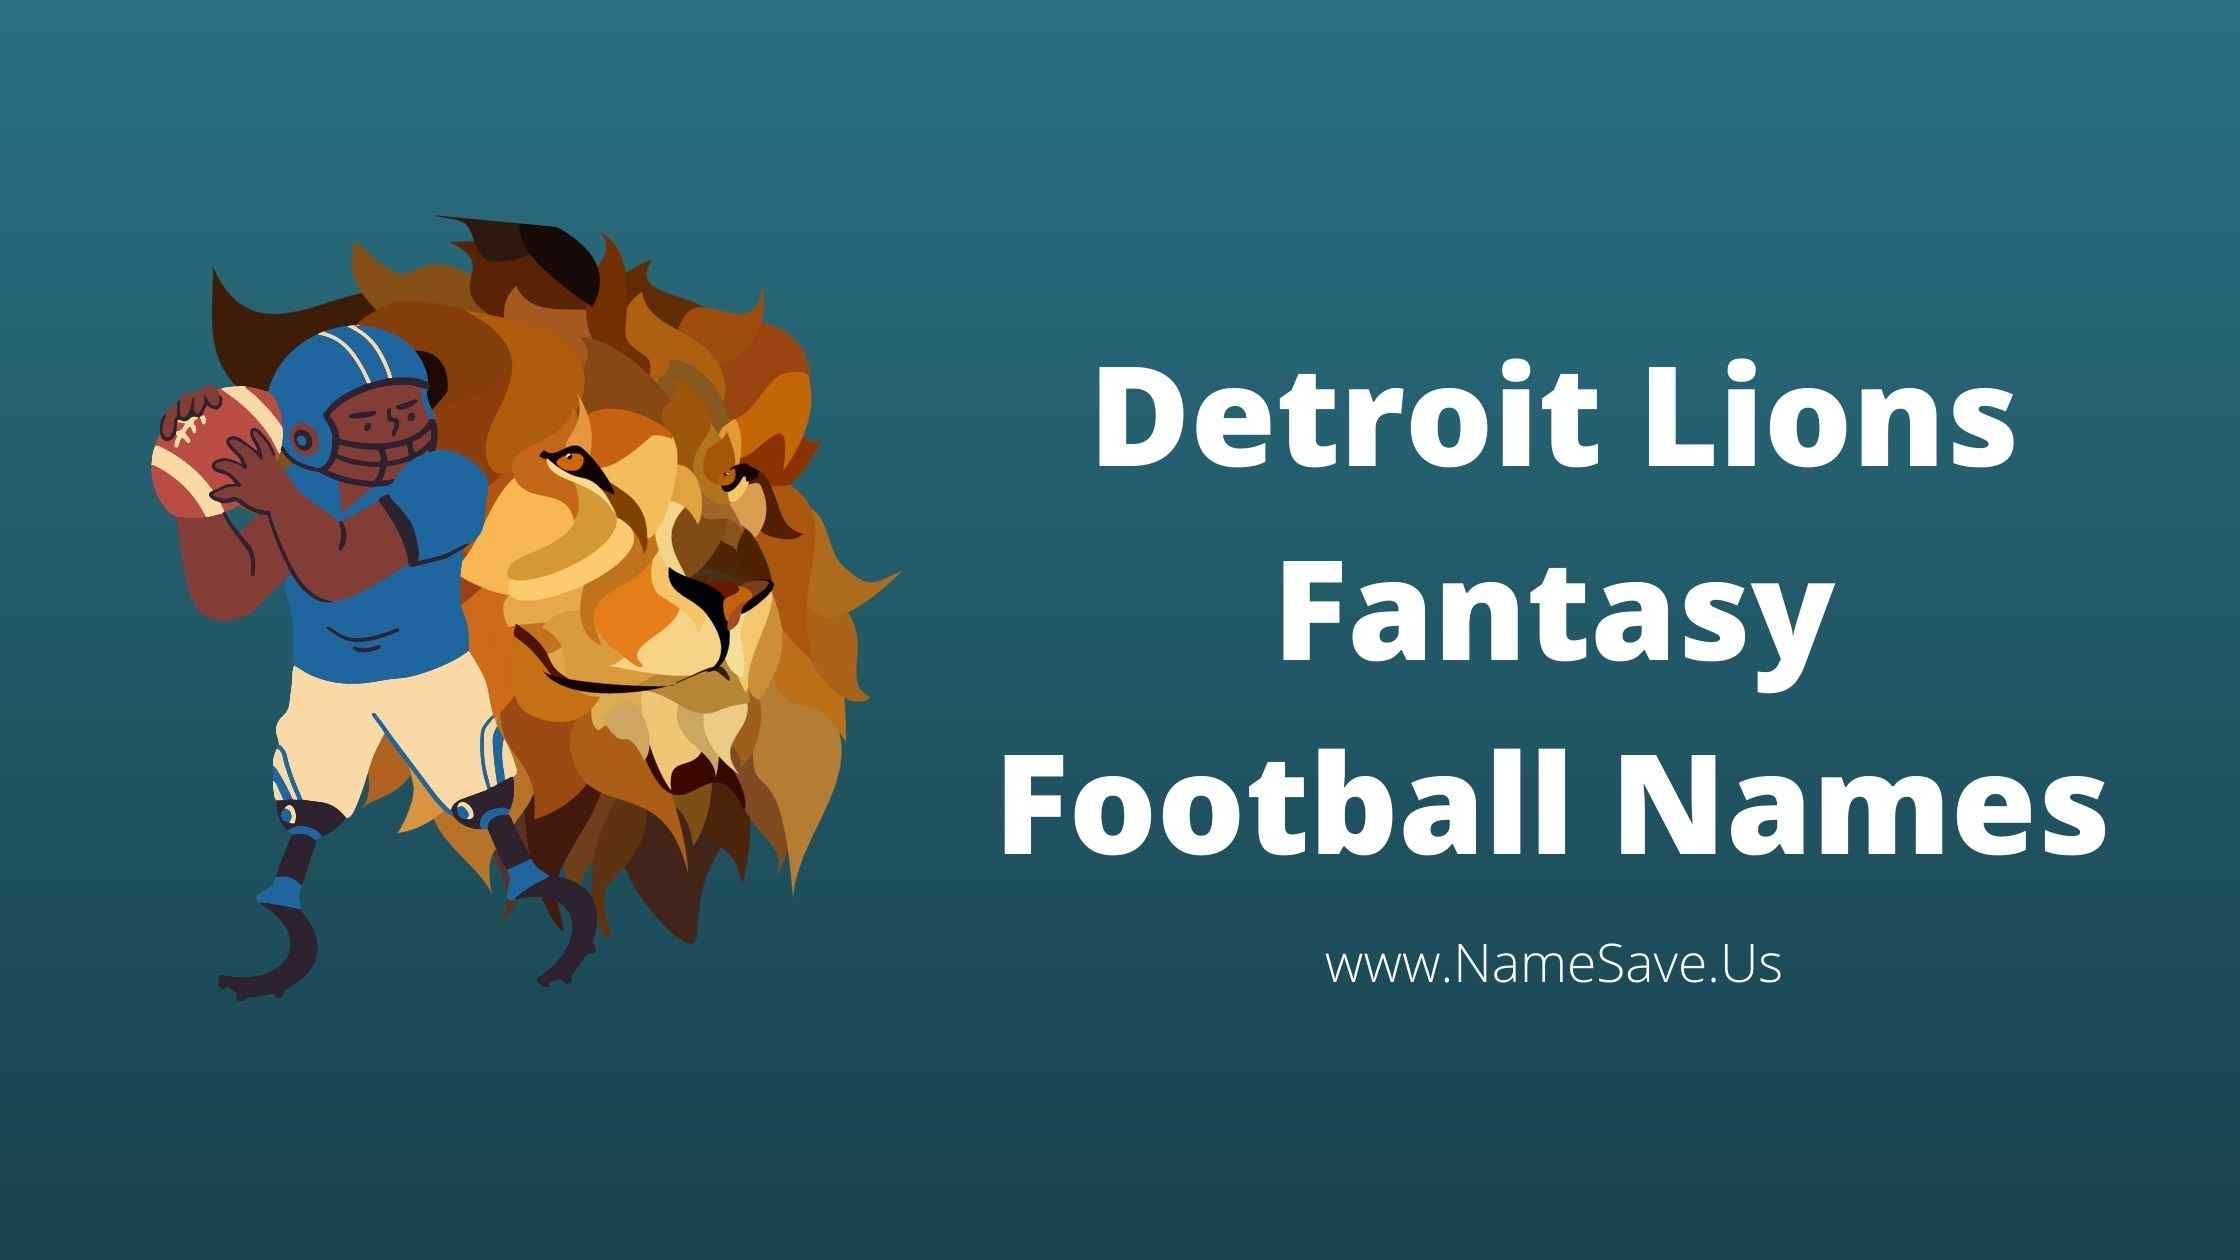 Detroit Lions Fantasy Football Names